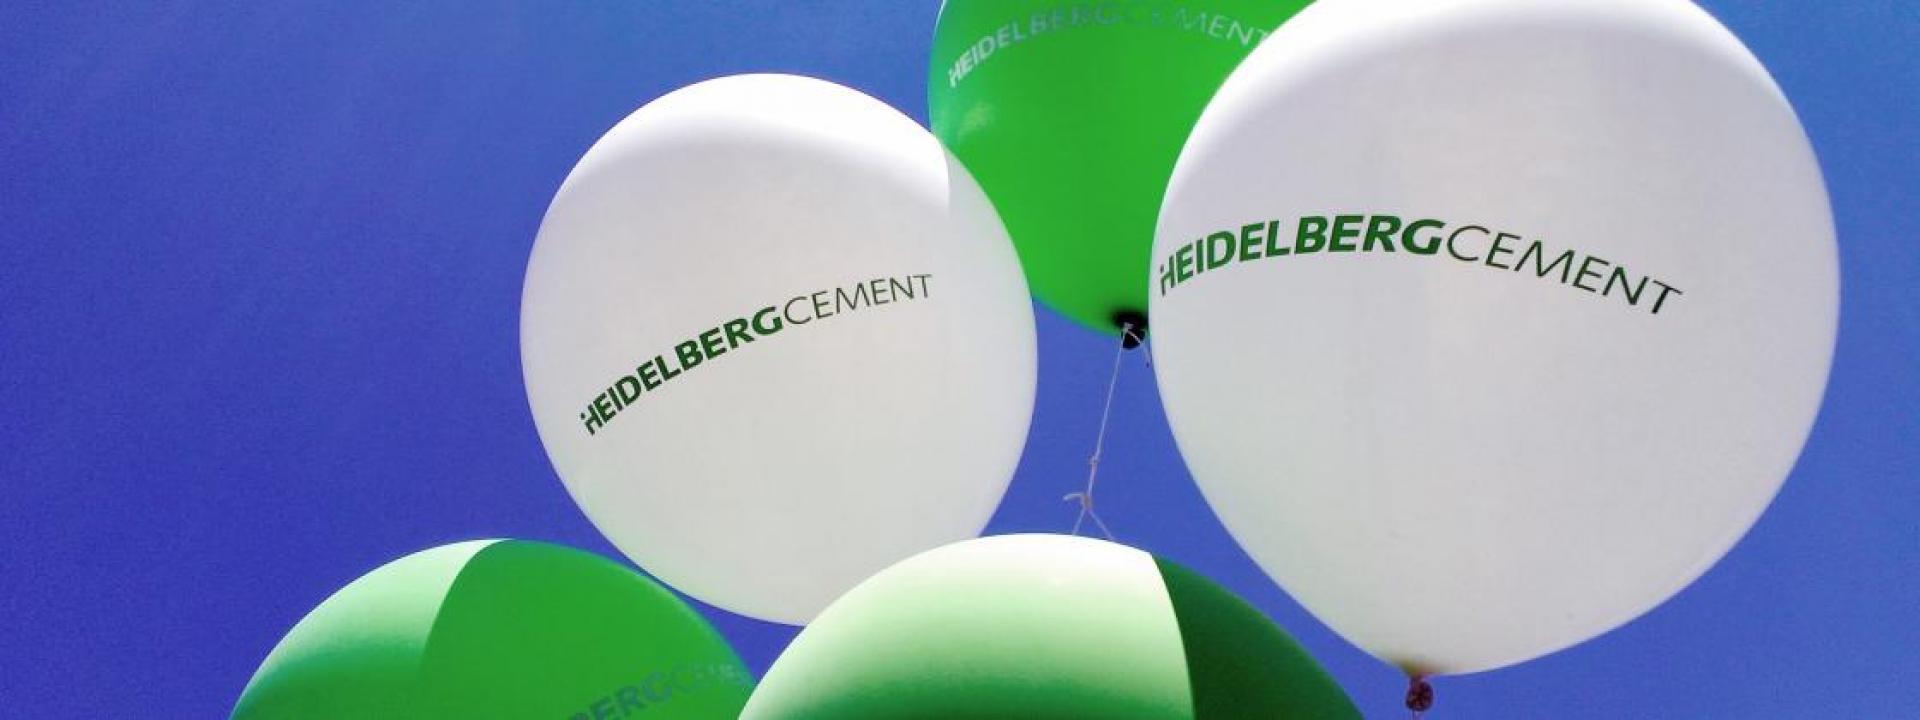 HeidelbergCement balloons.